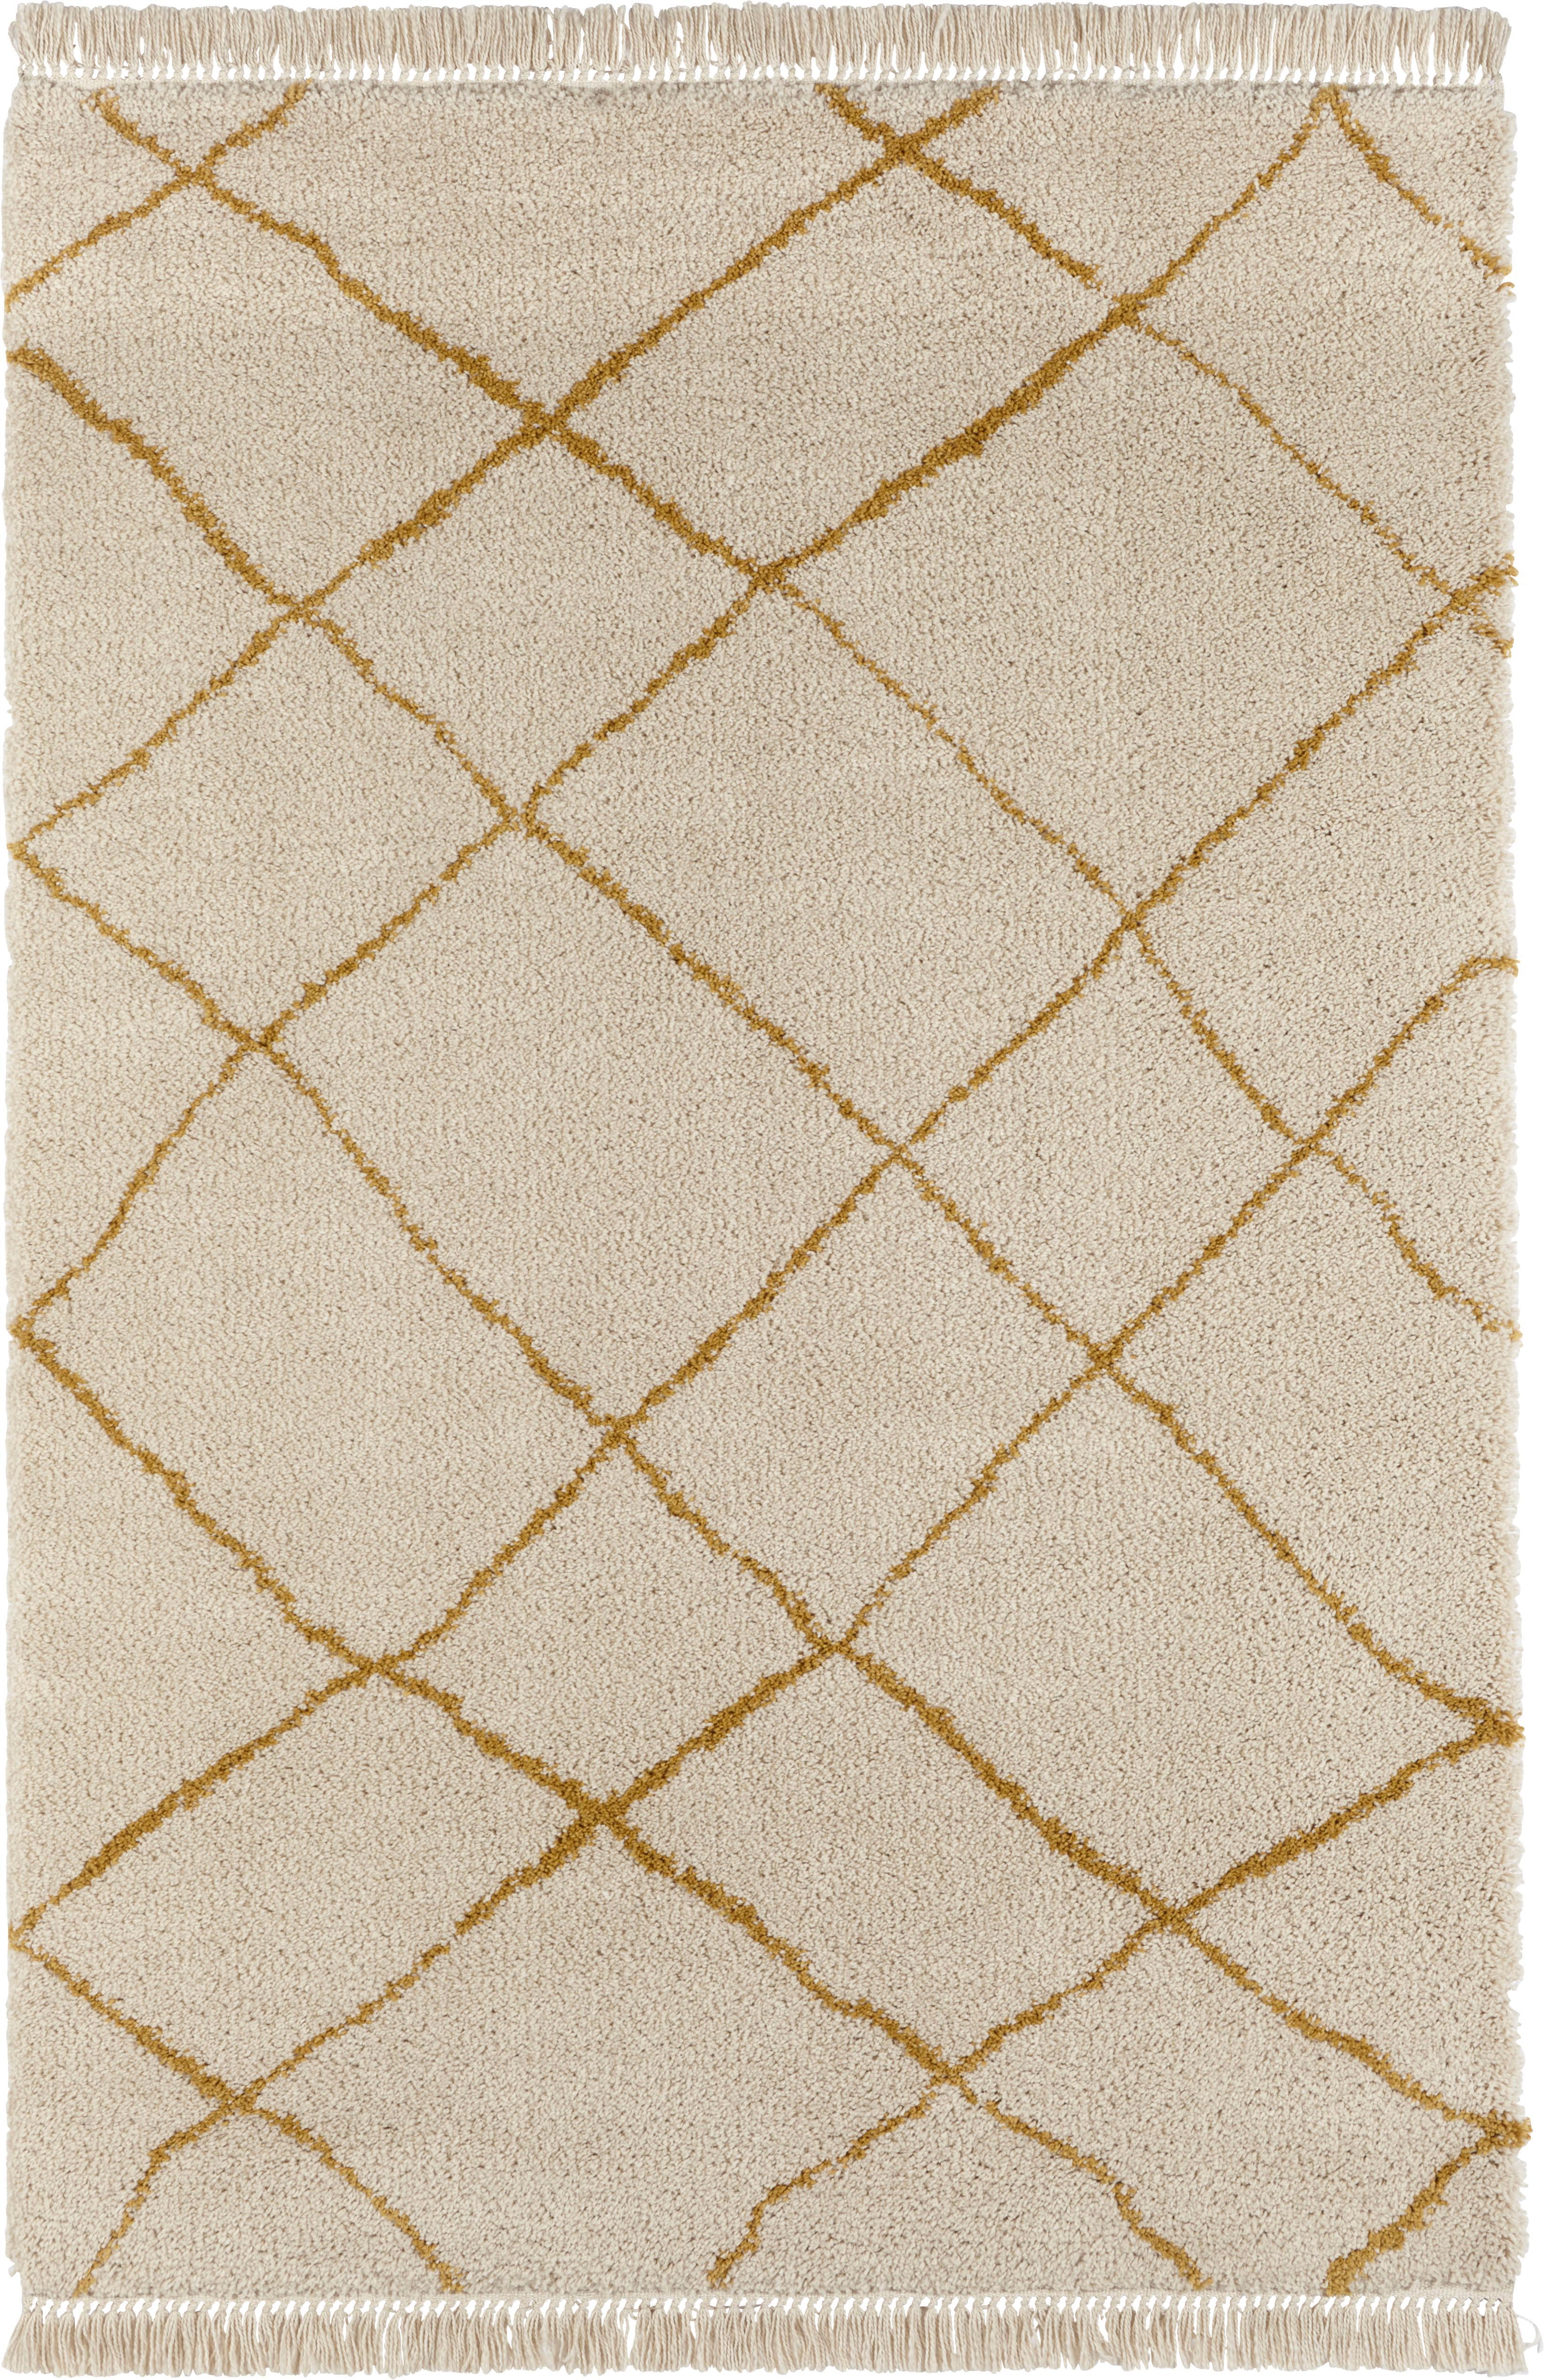 Pluizig hoogpolig vloerkleed Primrose in in crème kleur met ruitjesmotief, Crèmekleurig, goudgeel, B 120 x L 170 cm (maat S)